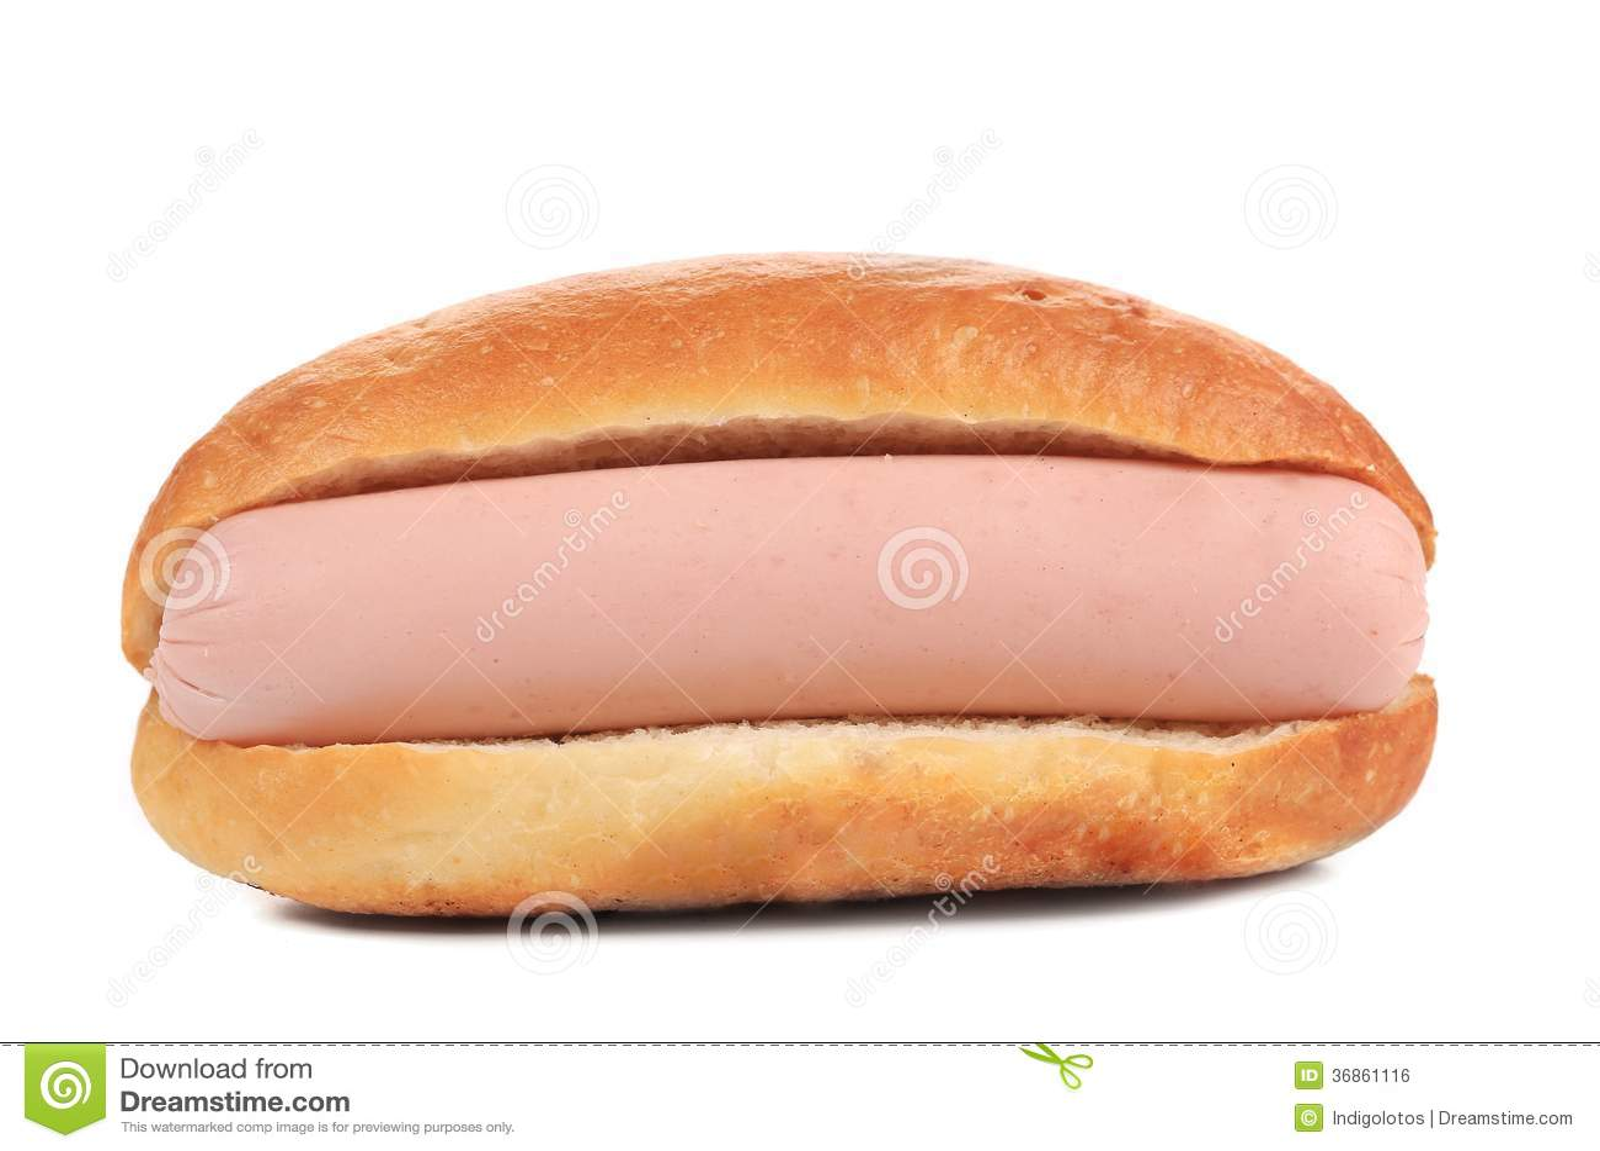 Hot Dog White Bread